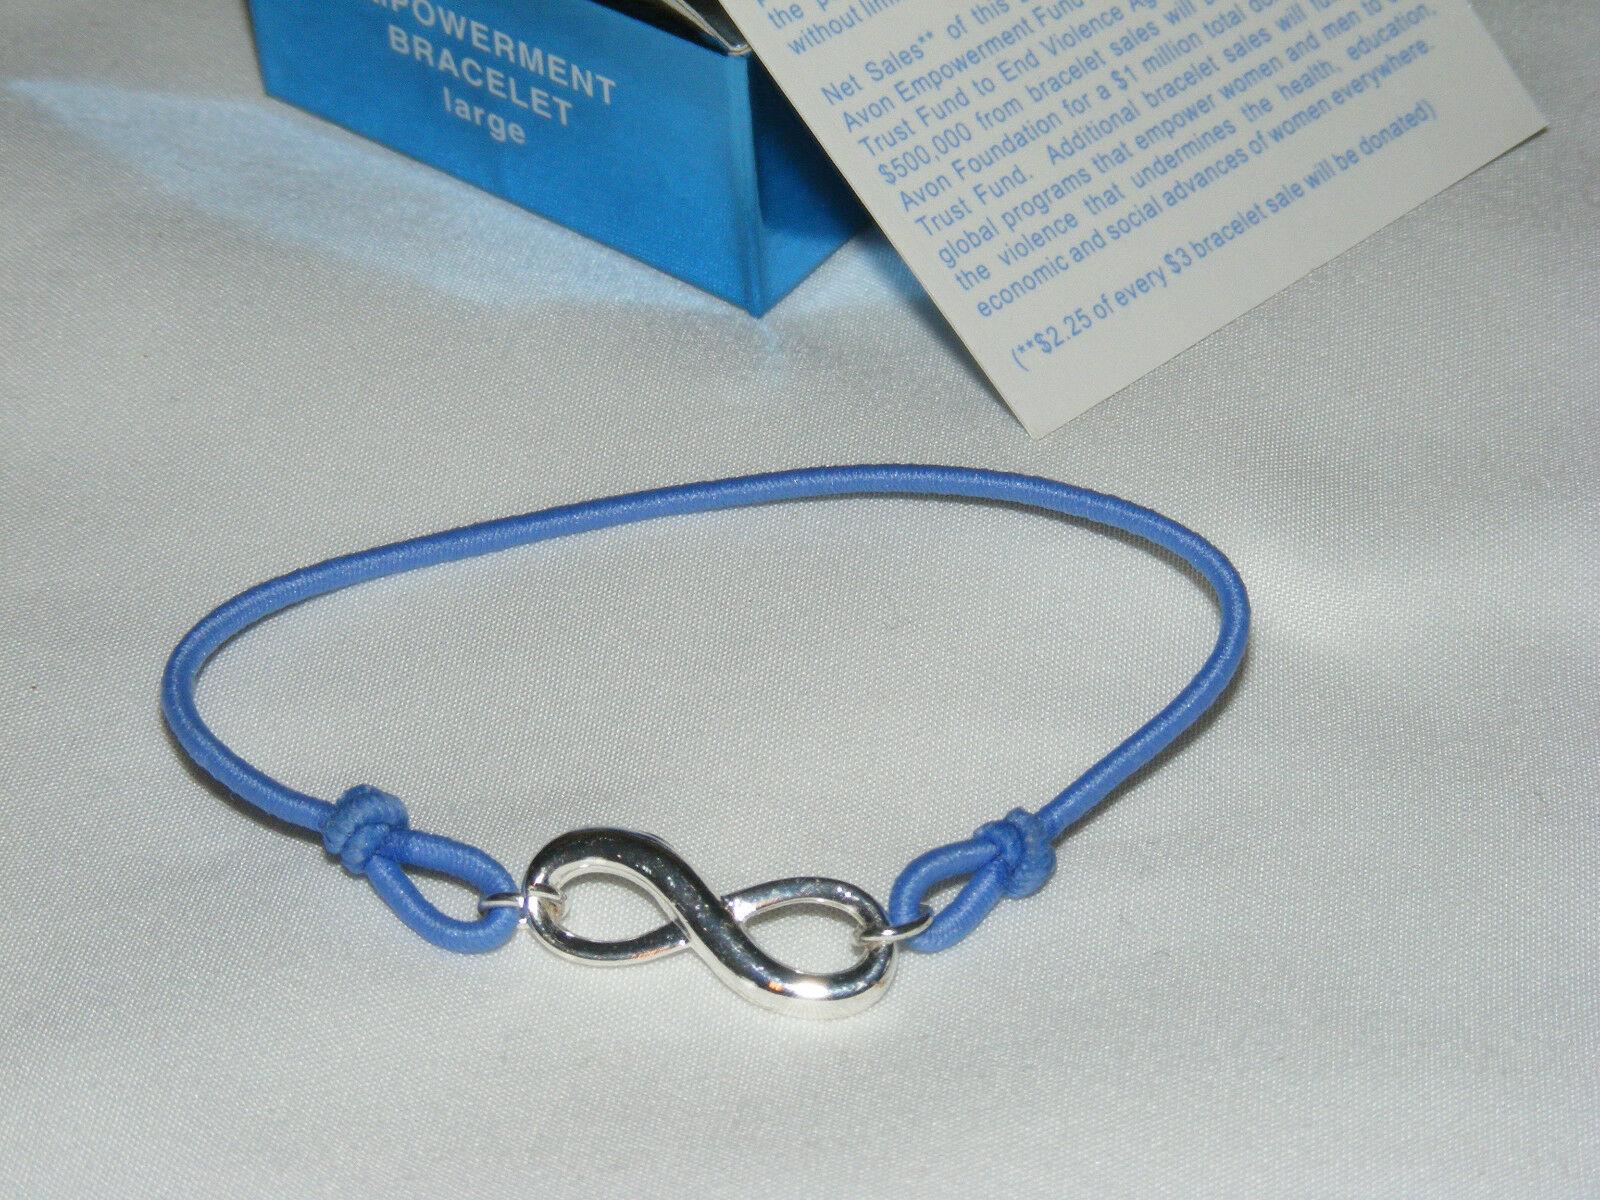 NIB (2008) AVON Empowerment Bracelet Infinity Symbol on Stretch Cord - Large AV5